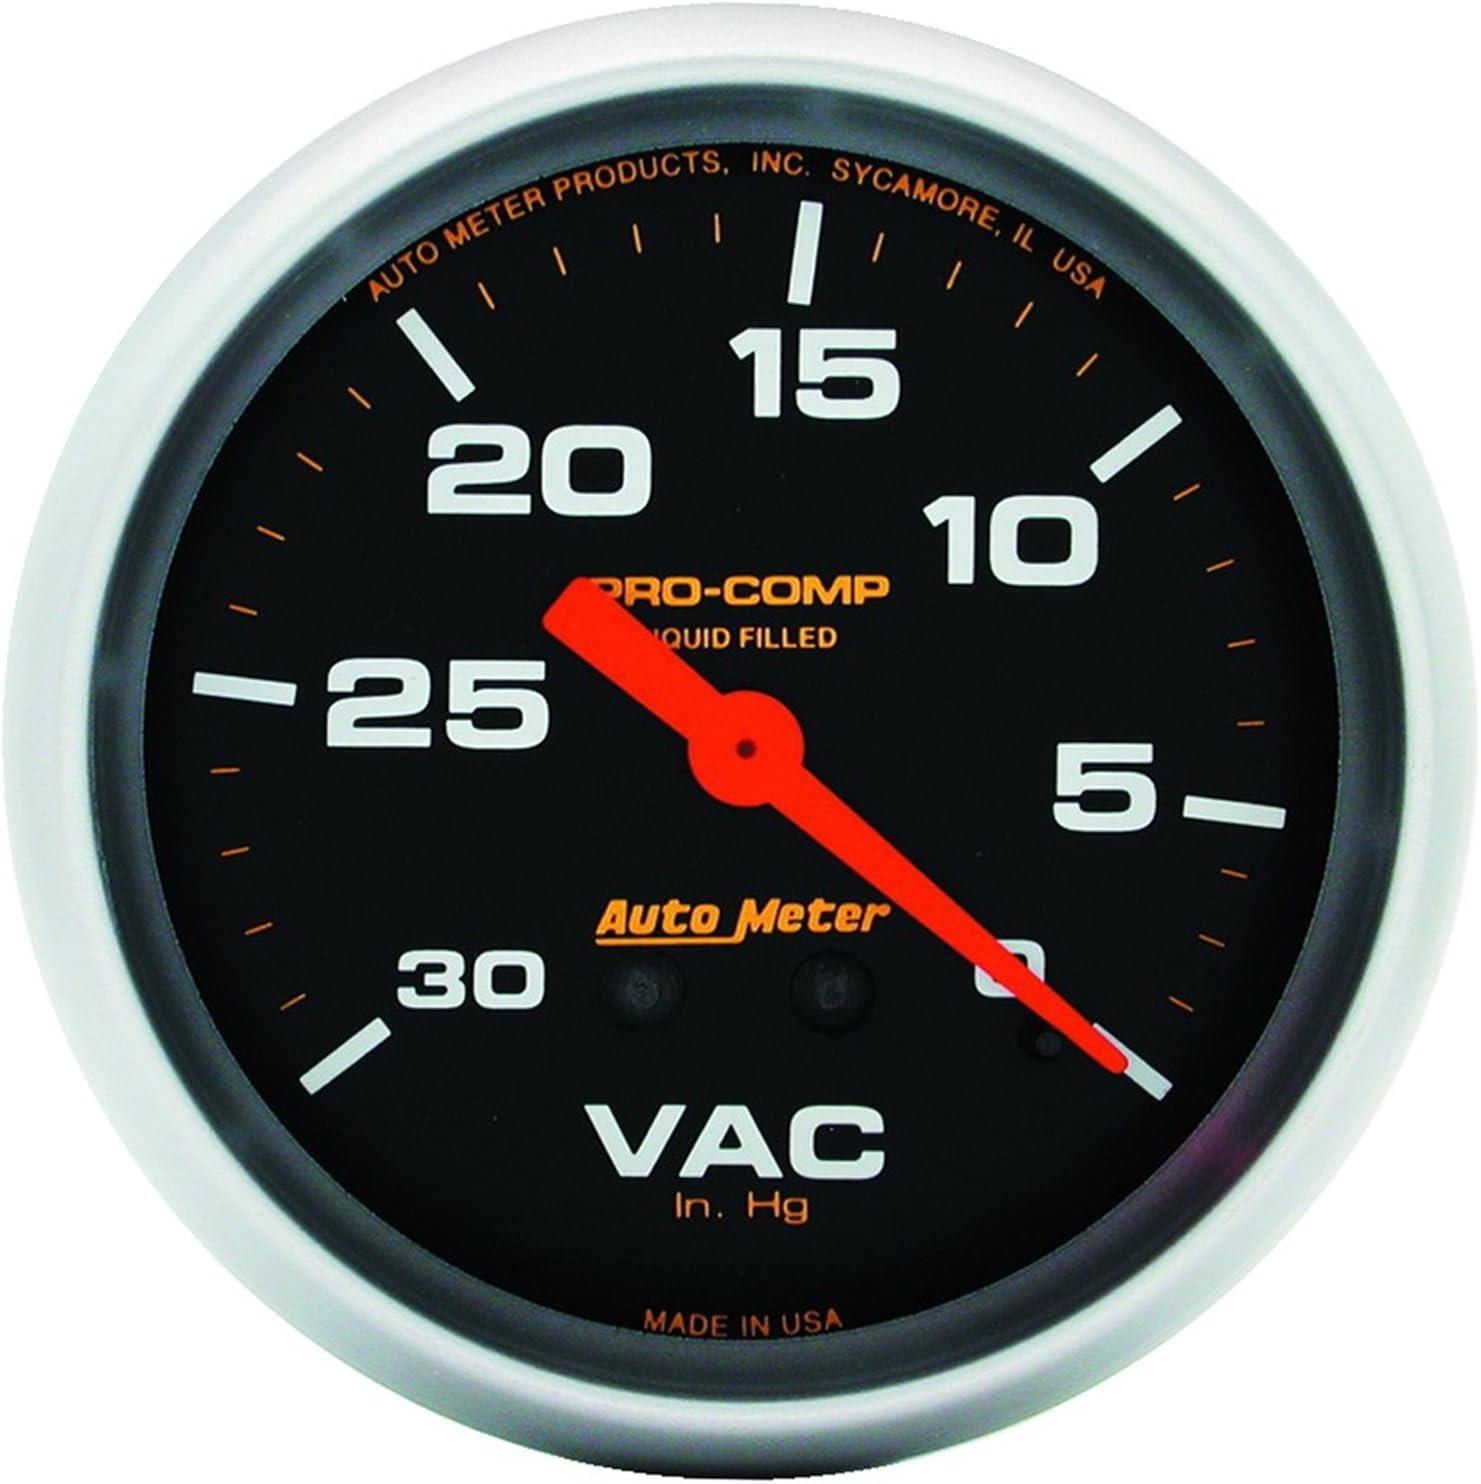 Auto Meter 5484 Pro-Comp Liquid-Filled Mechanical Vacuum Gauge